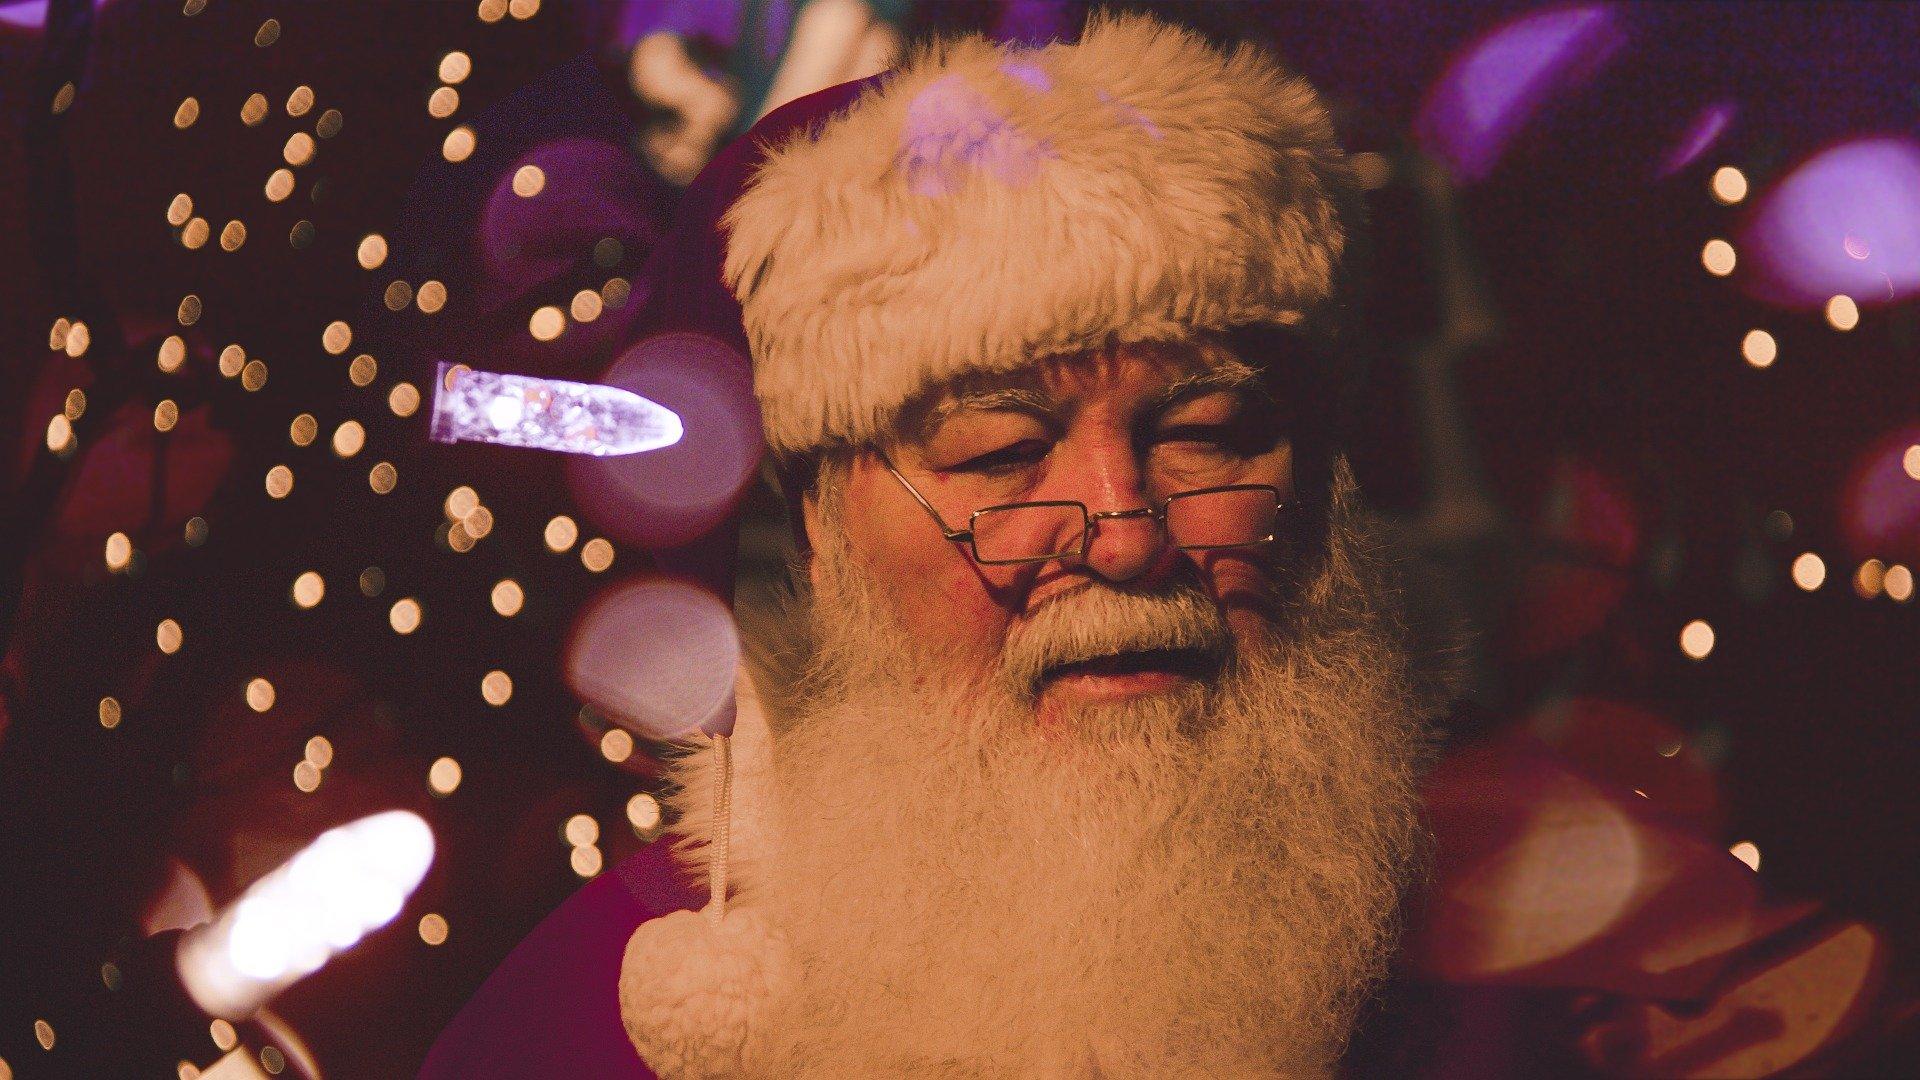 Proudly Supporting Santa www.noradsanta.org